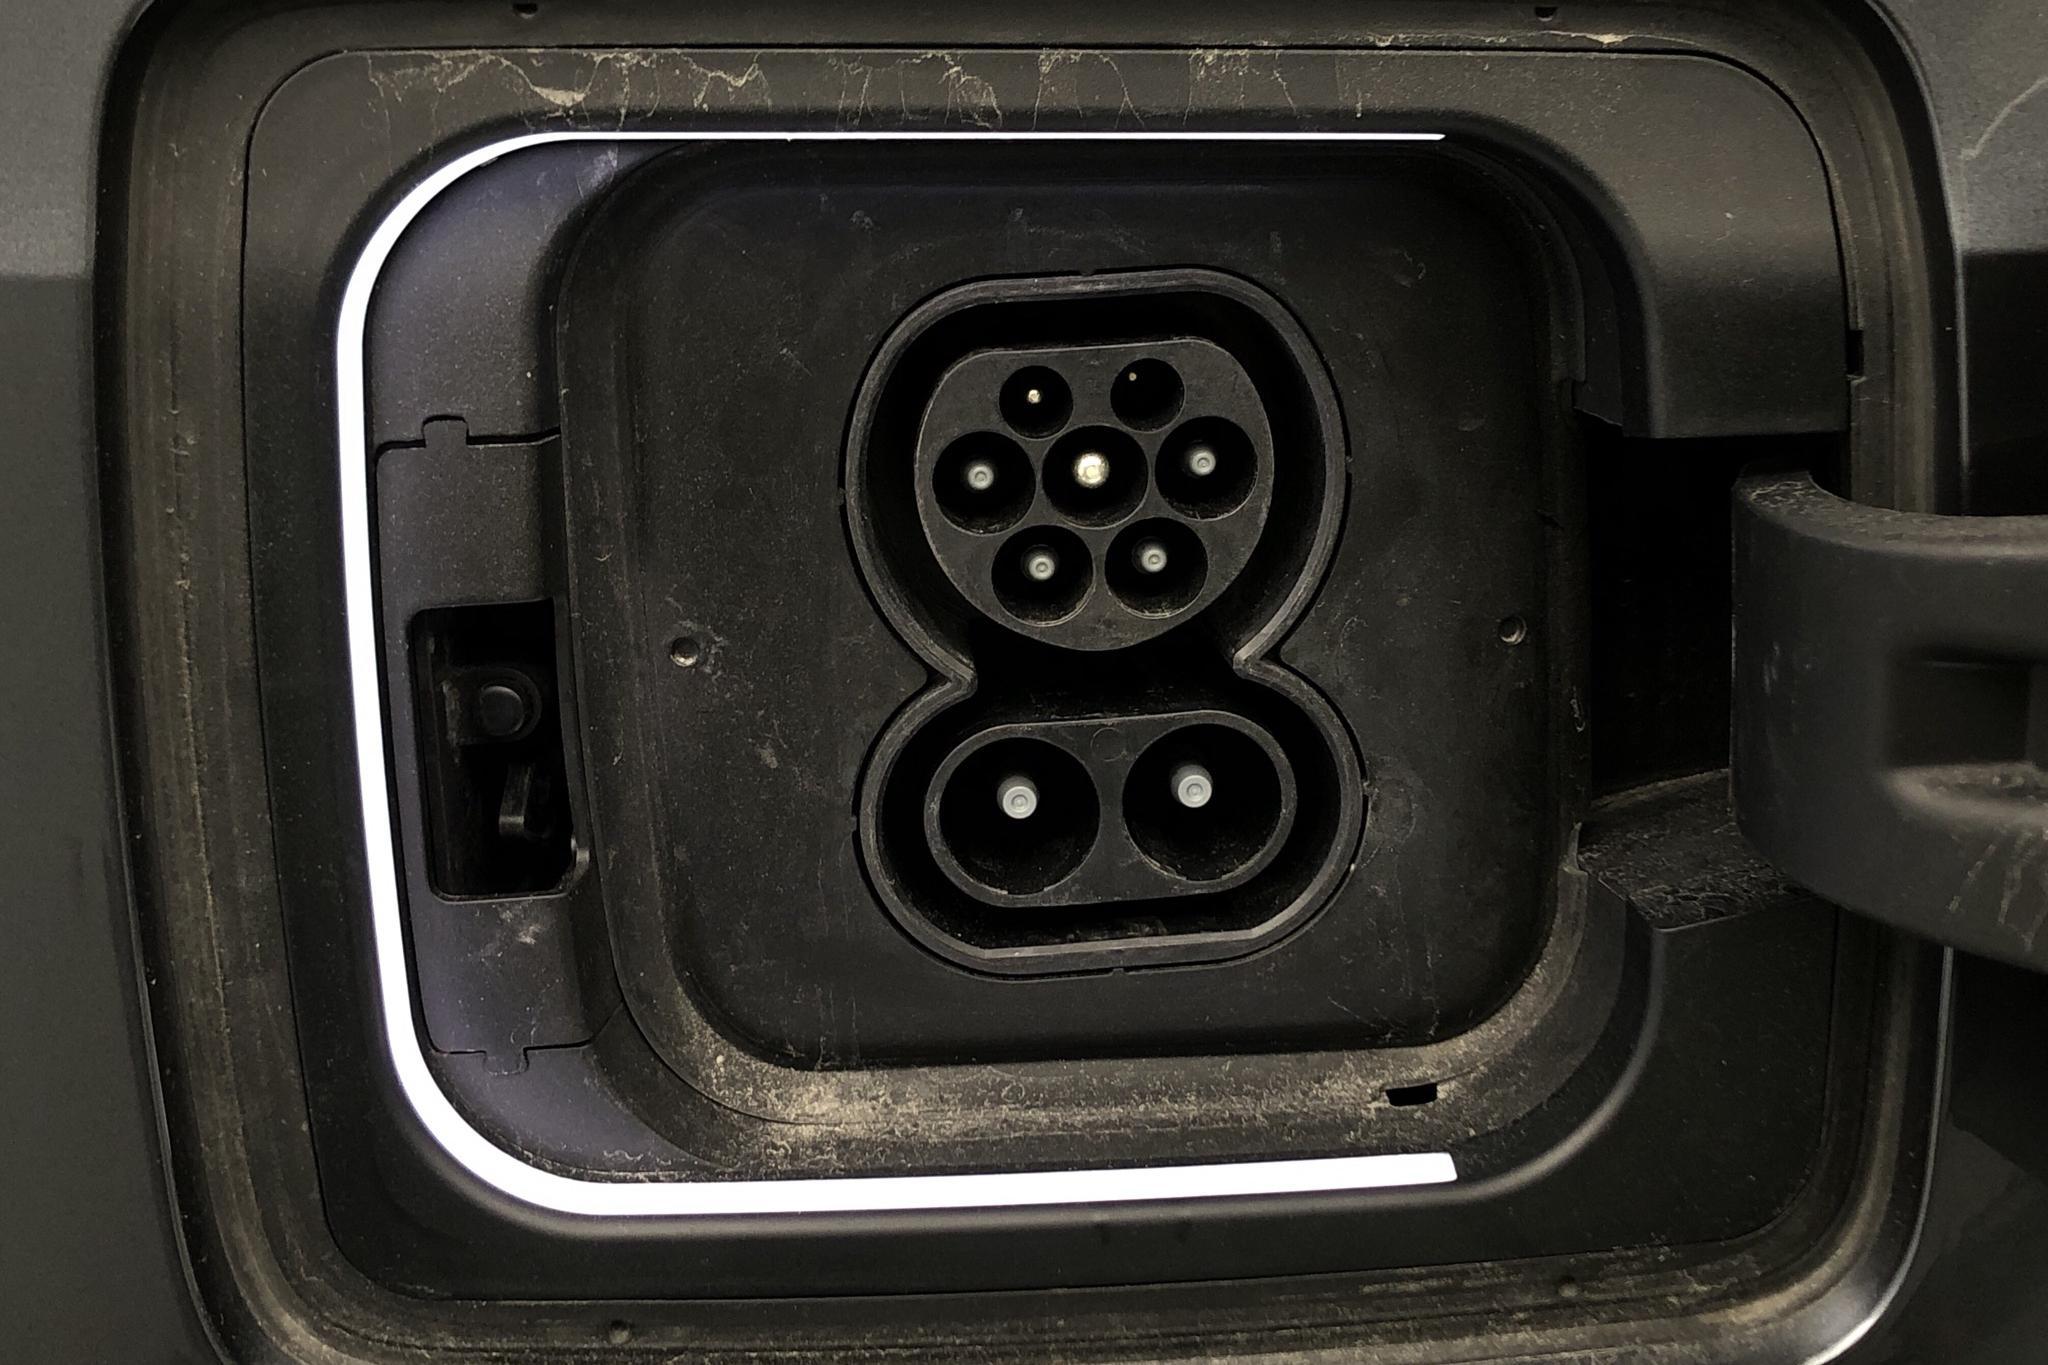 BMW i3 94Ah, I01 (170hk) - 33 230 km - Automatic - gray - 2018